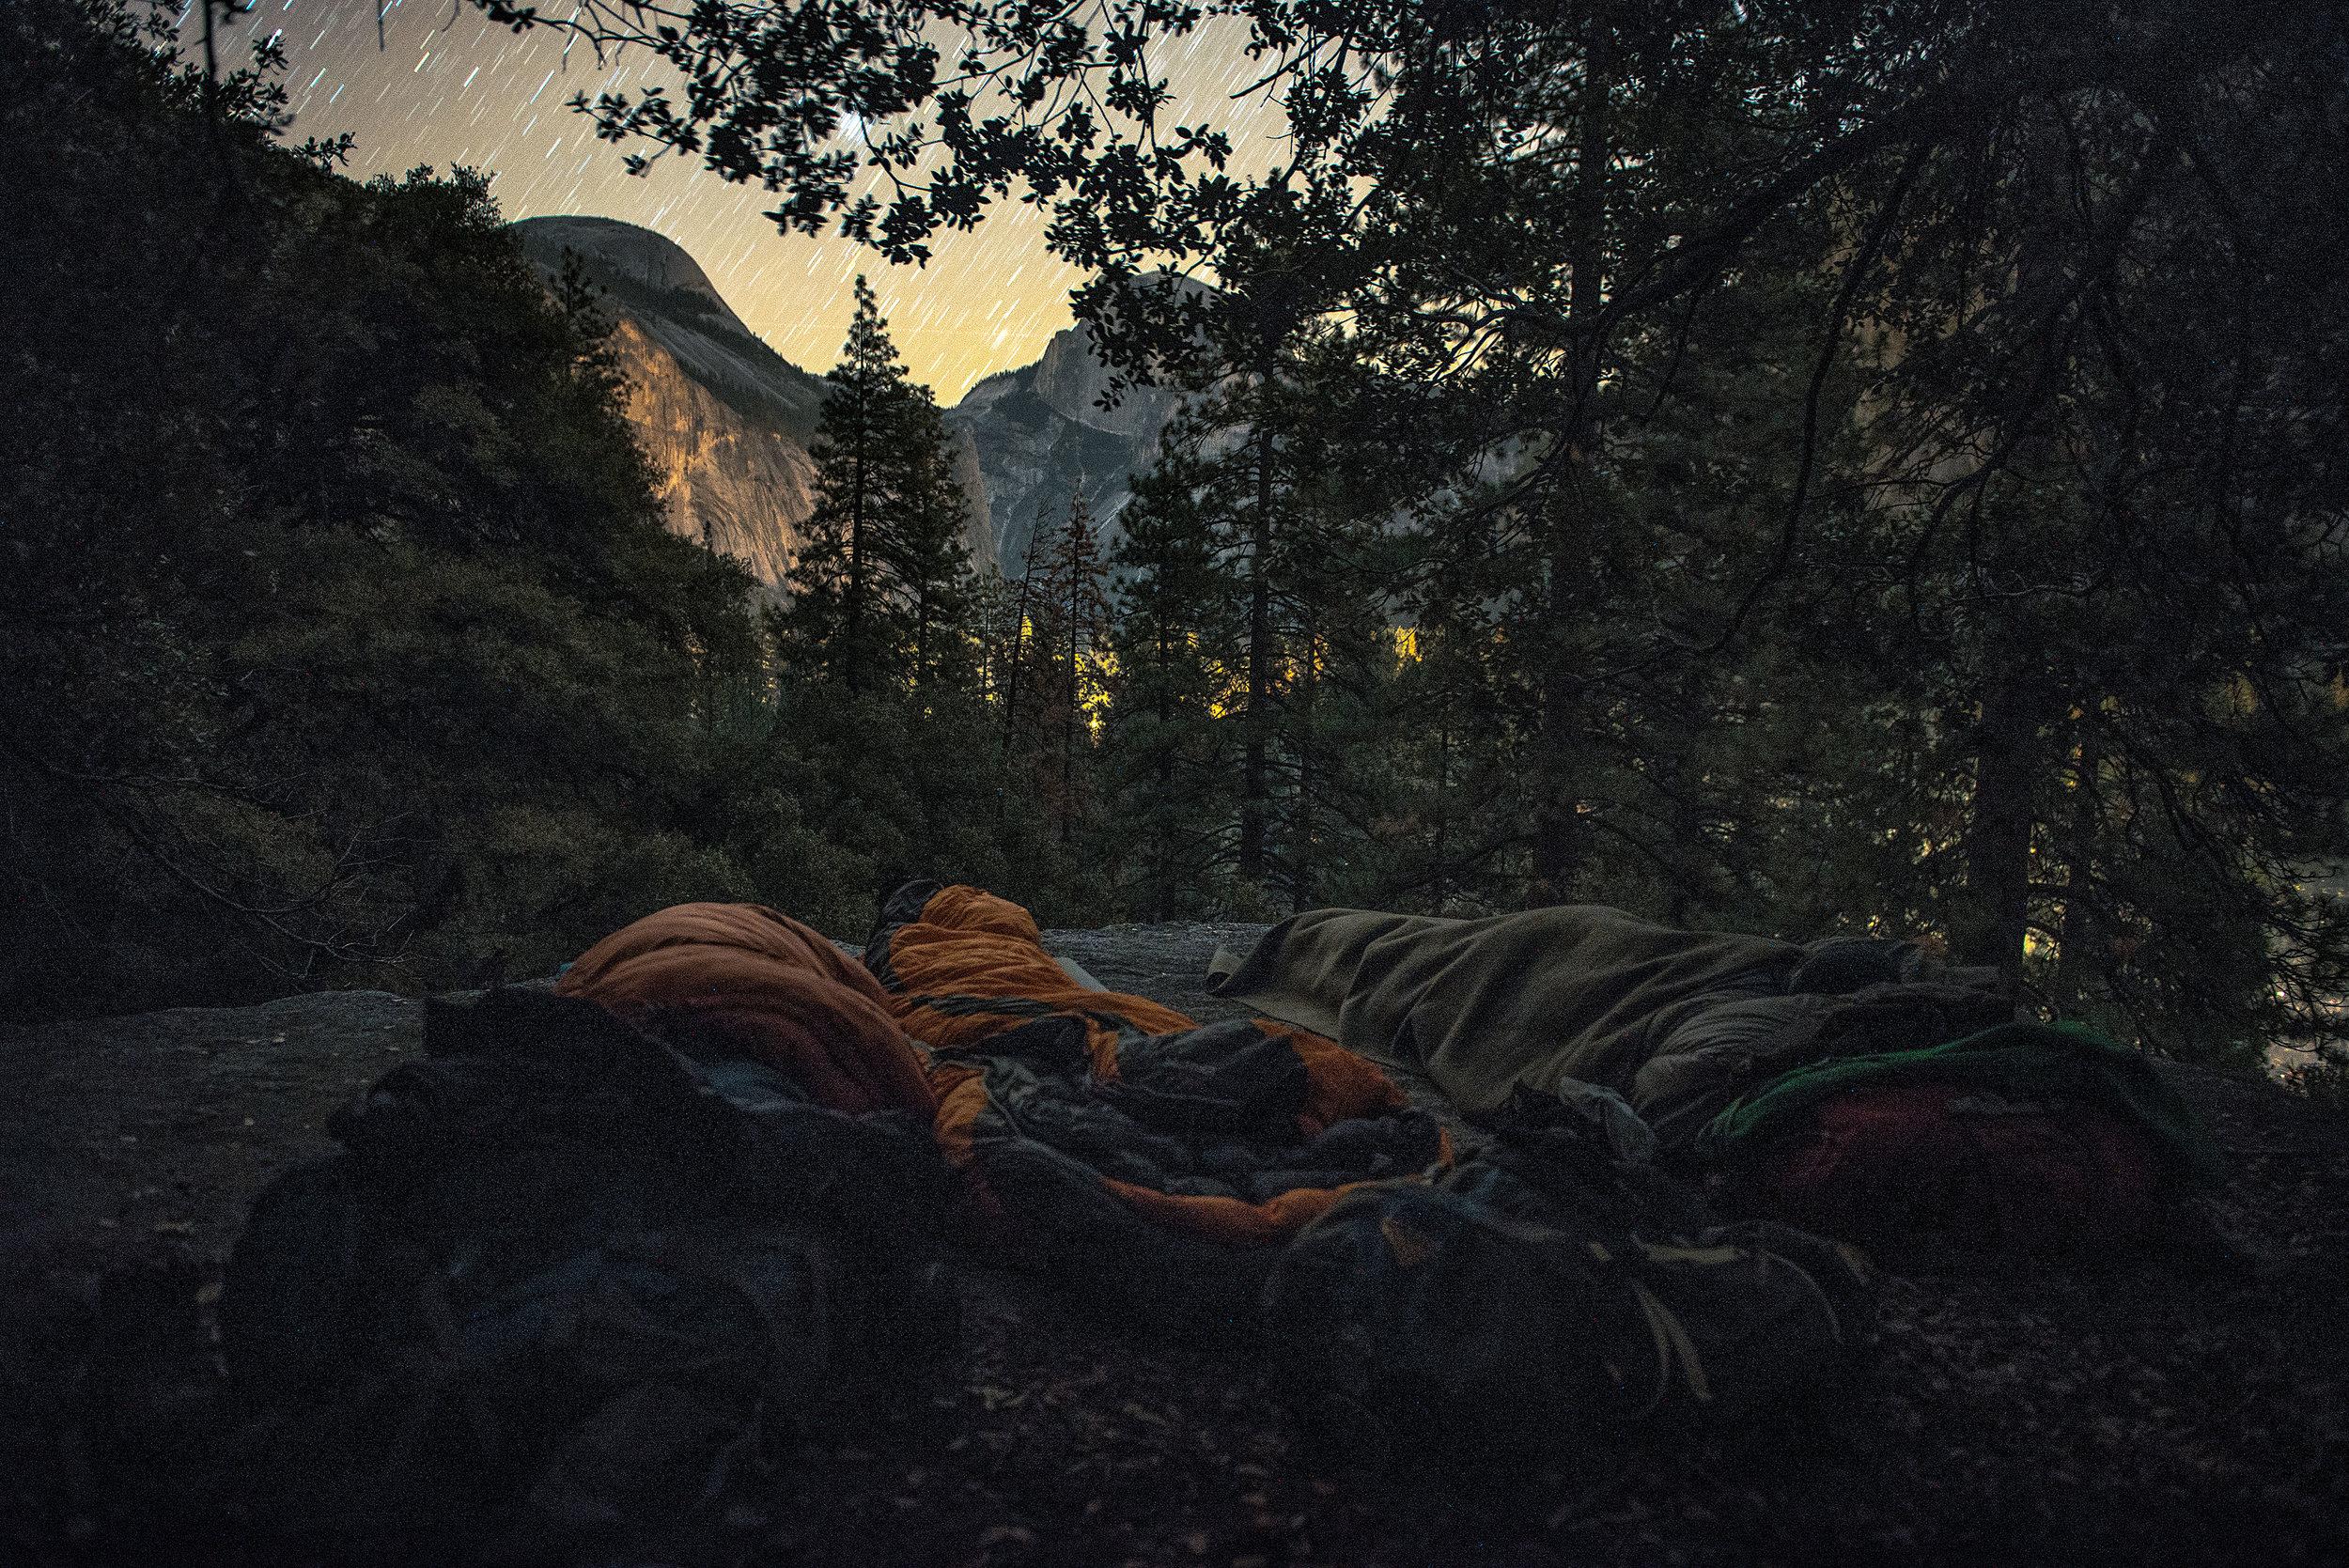 austin-trigg-wing-suit-base-jump-fly-half-dome-yosemite-lifestyle-california-adventure-thrill-seeking-sleeping-bag.jpg